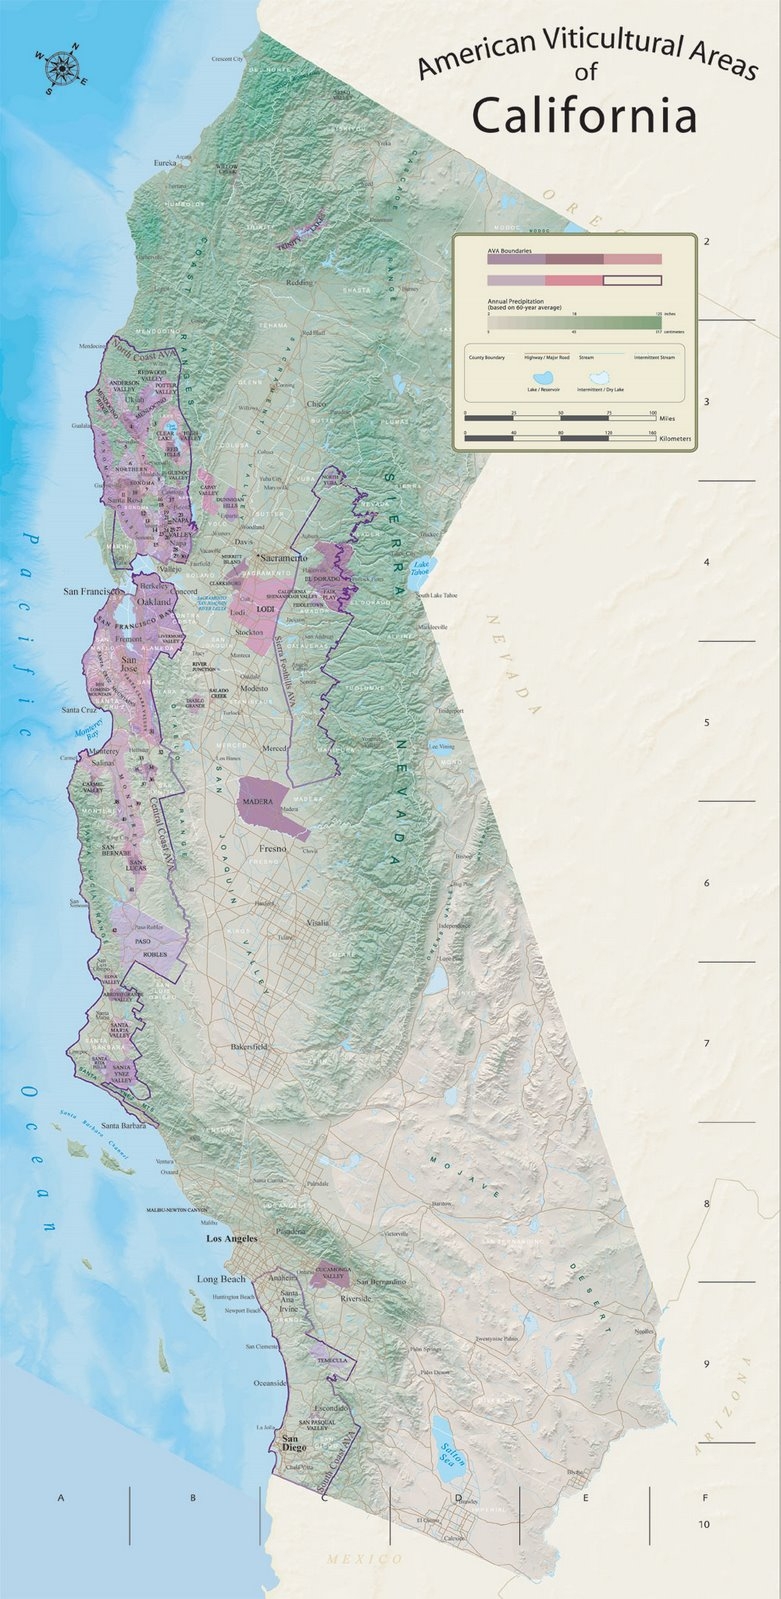 Ca Ava Map Jpg 781 1599 Usa Pinterest Wine In California Ava - Touran - California Ava Map